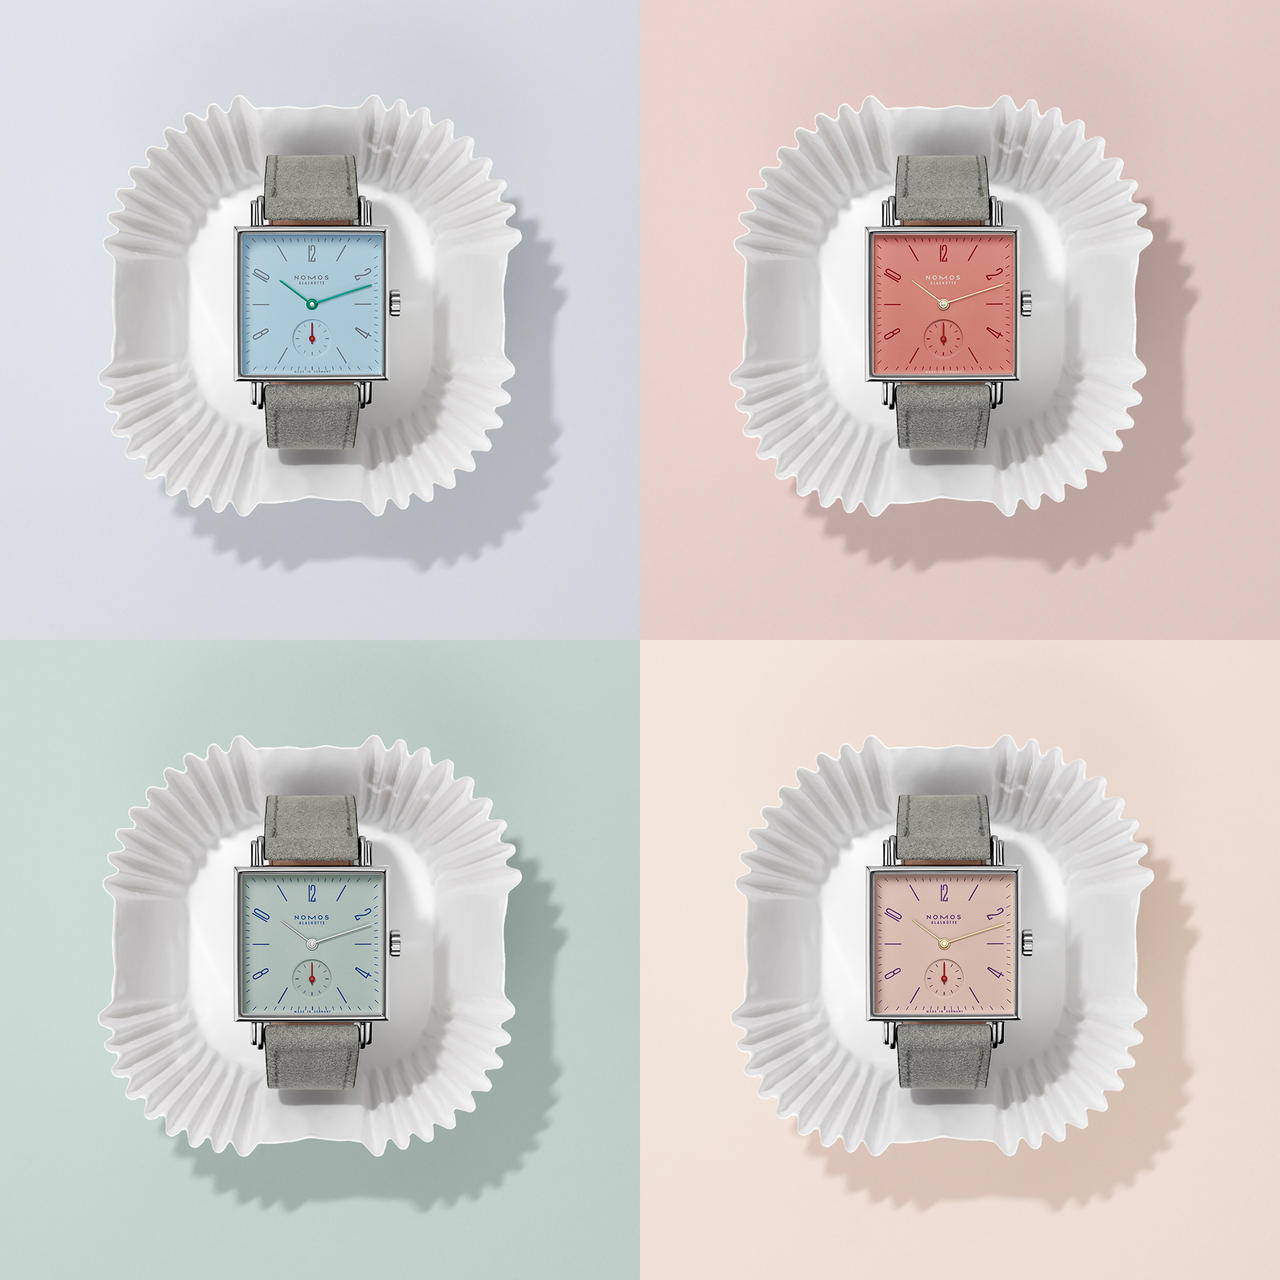 Nomos Tetra Petit Four Series Timepieces